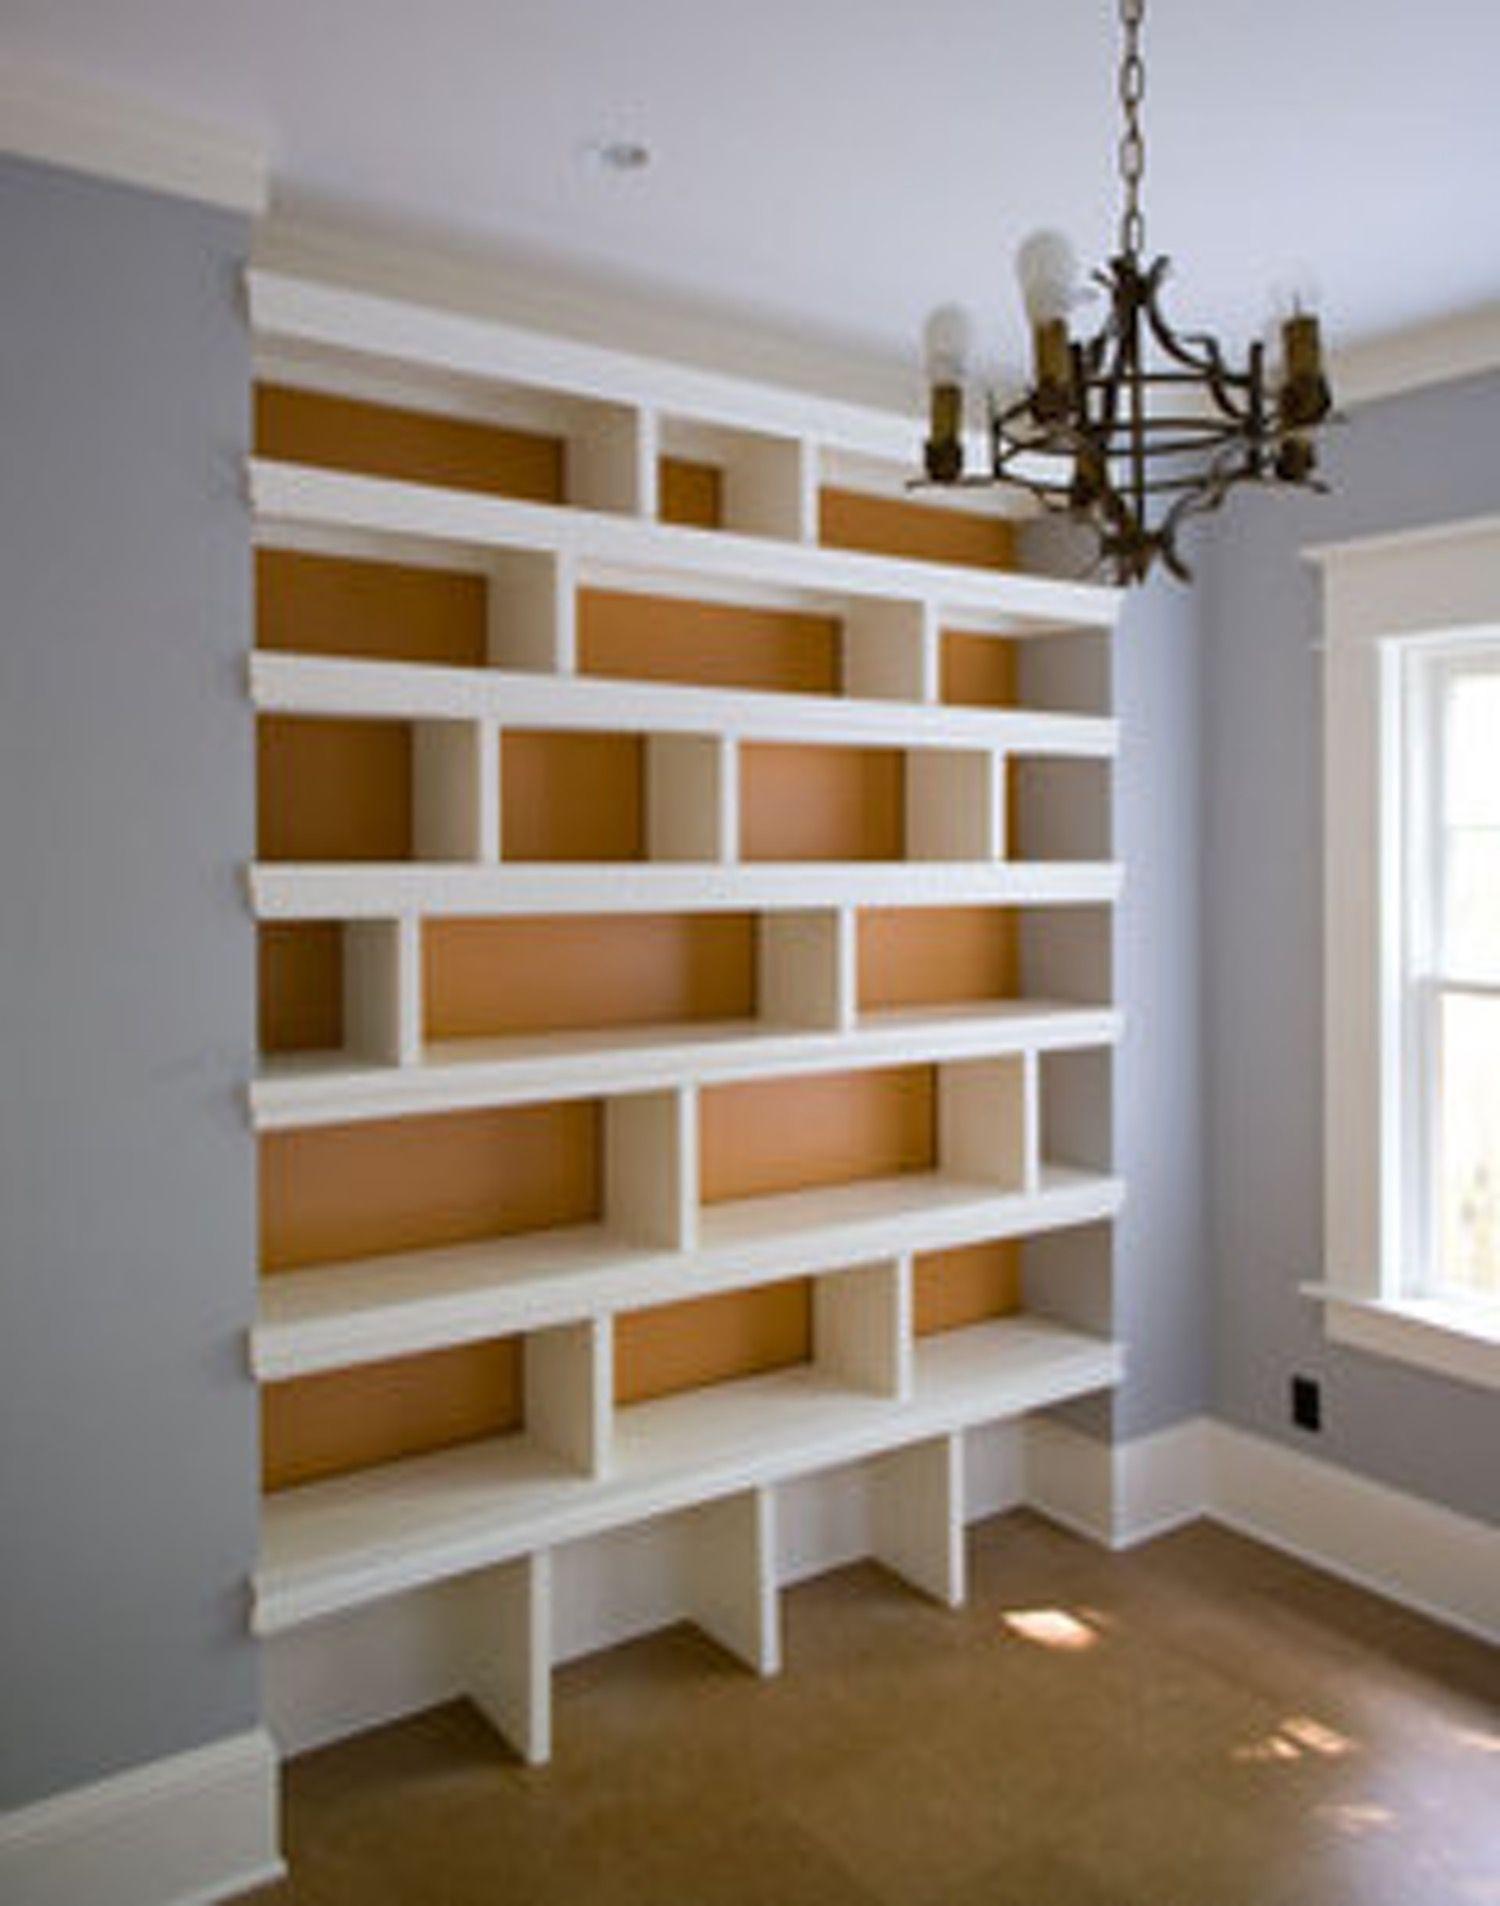 Look Bump Out Bookshelves Small Space Bookshelves Shelves